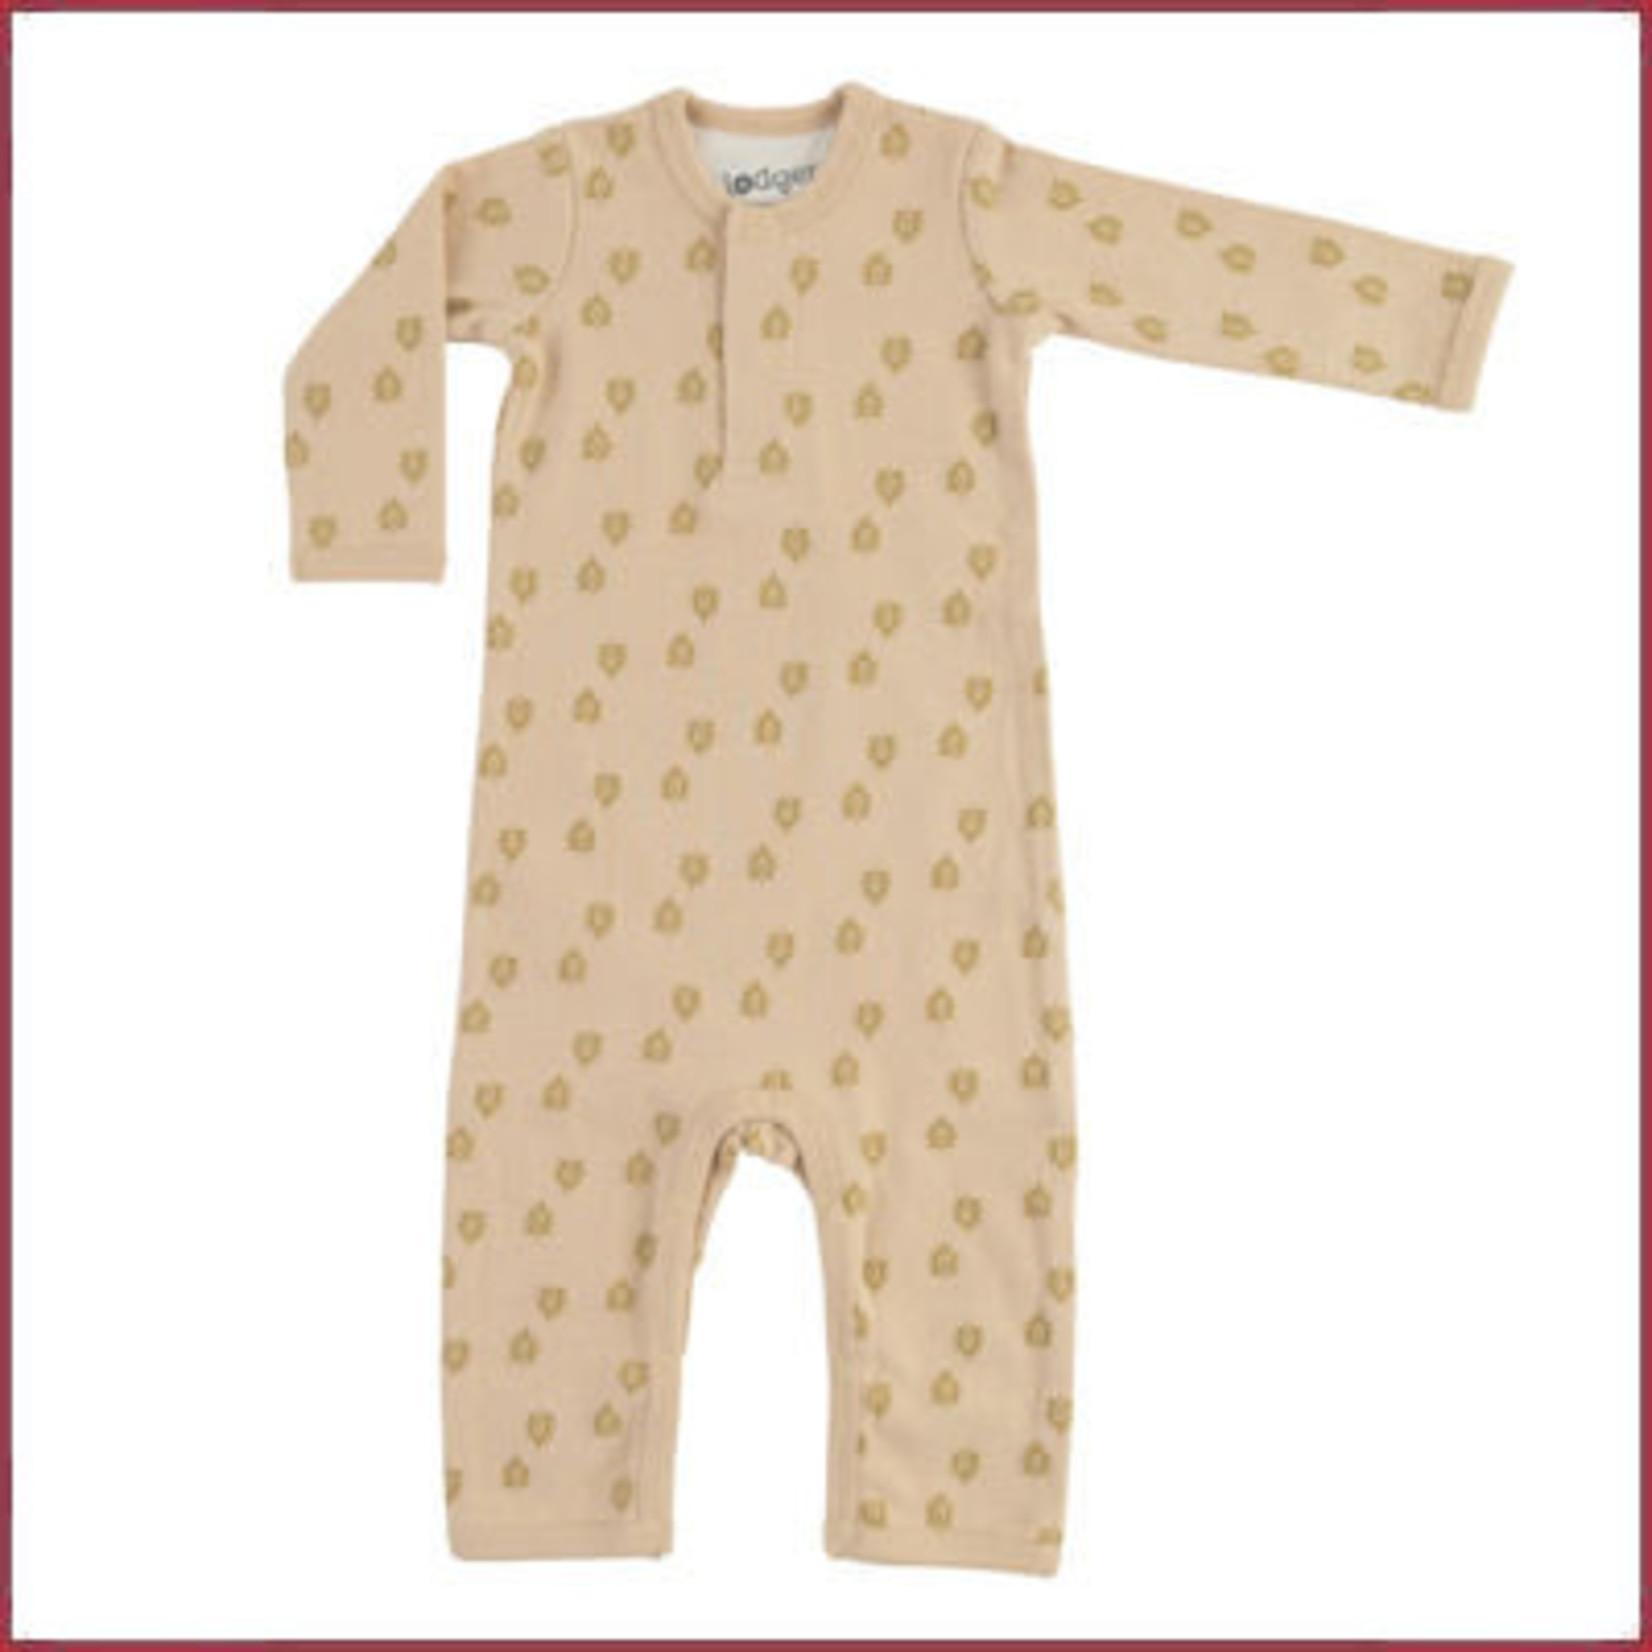 Lodger Baby Boxpakje Nomad Rib Linen